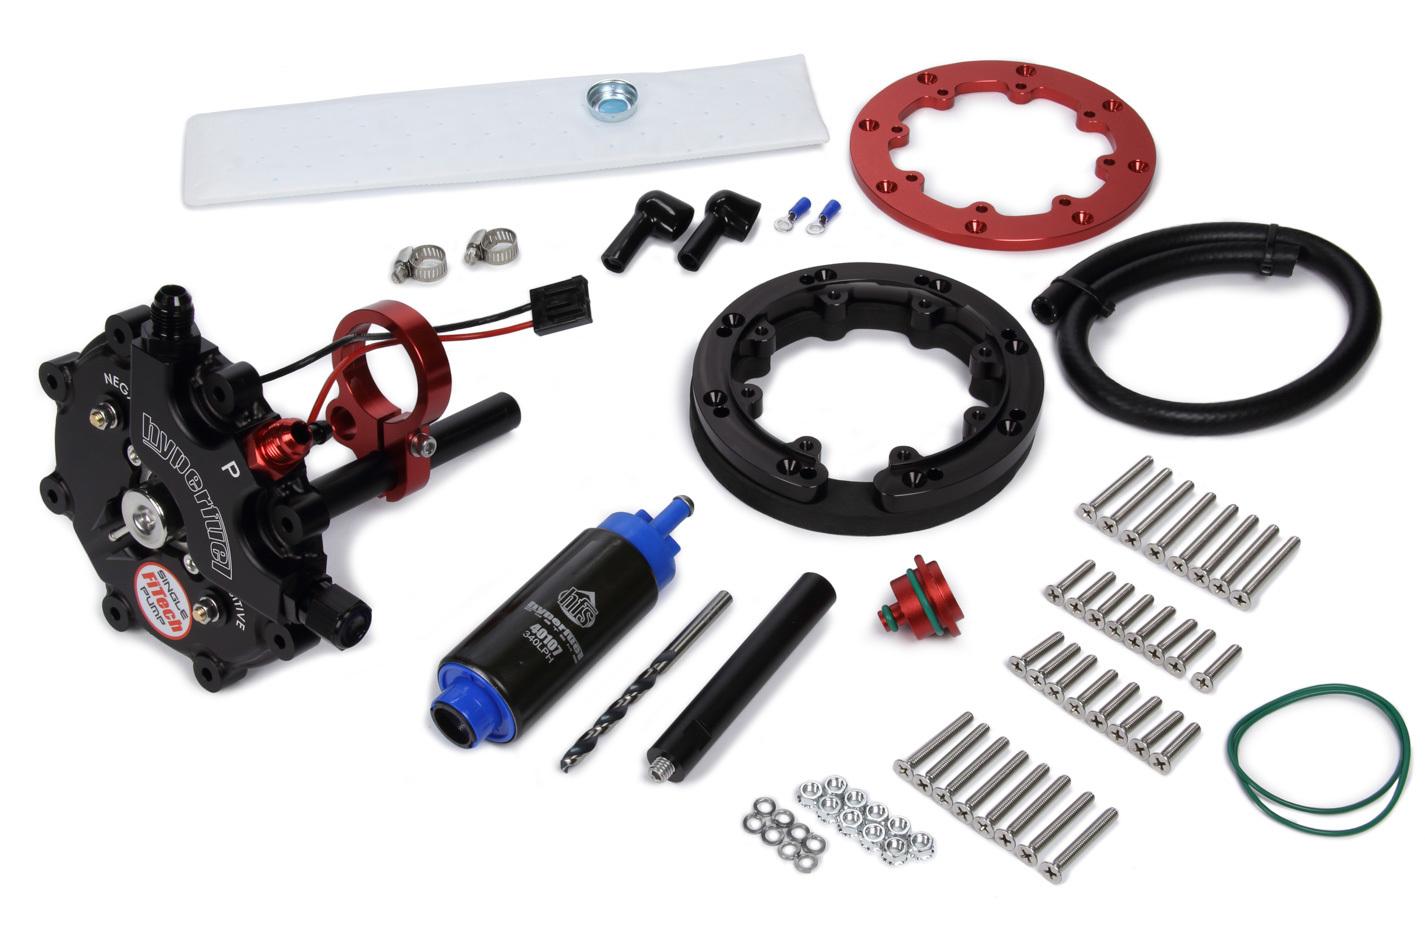 FST Performance Carburetor 40019 Fuel Pump, G-Sump, Electric, In-Tank, Single Pump, 340 lph, 6 AN Fittings, Gas, Each